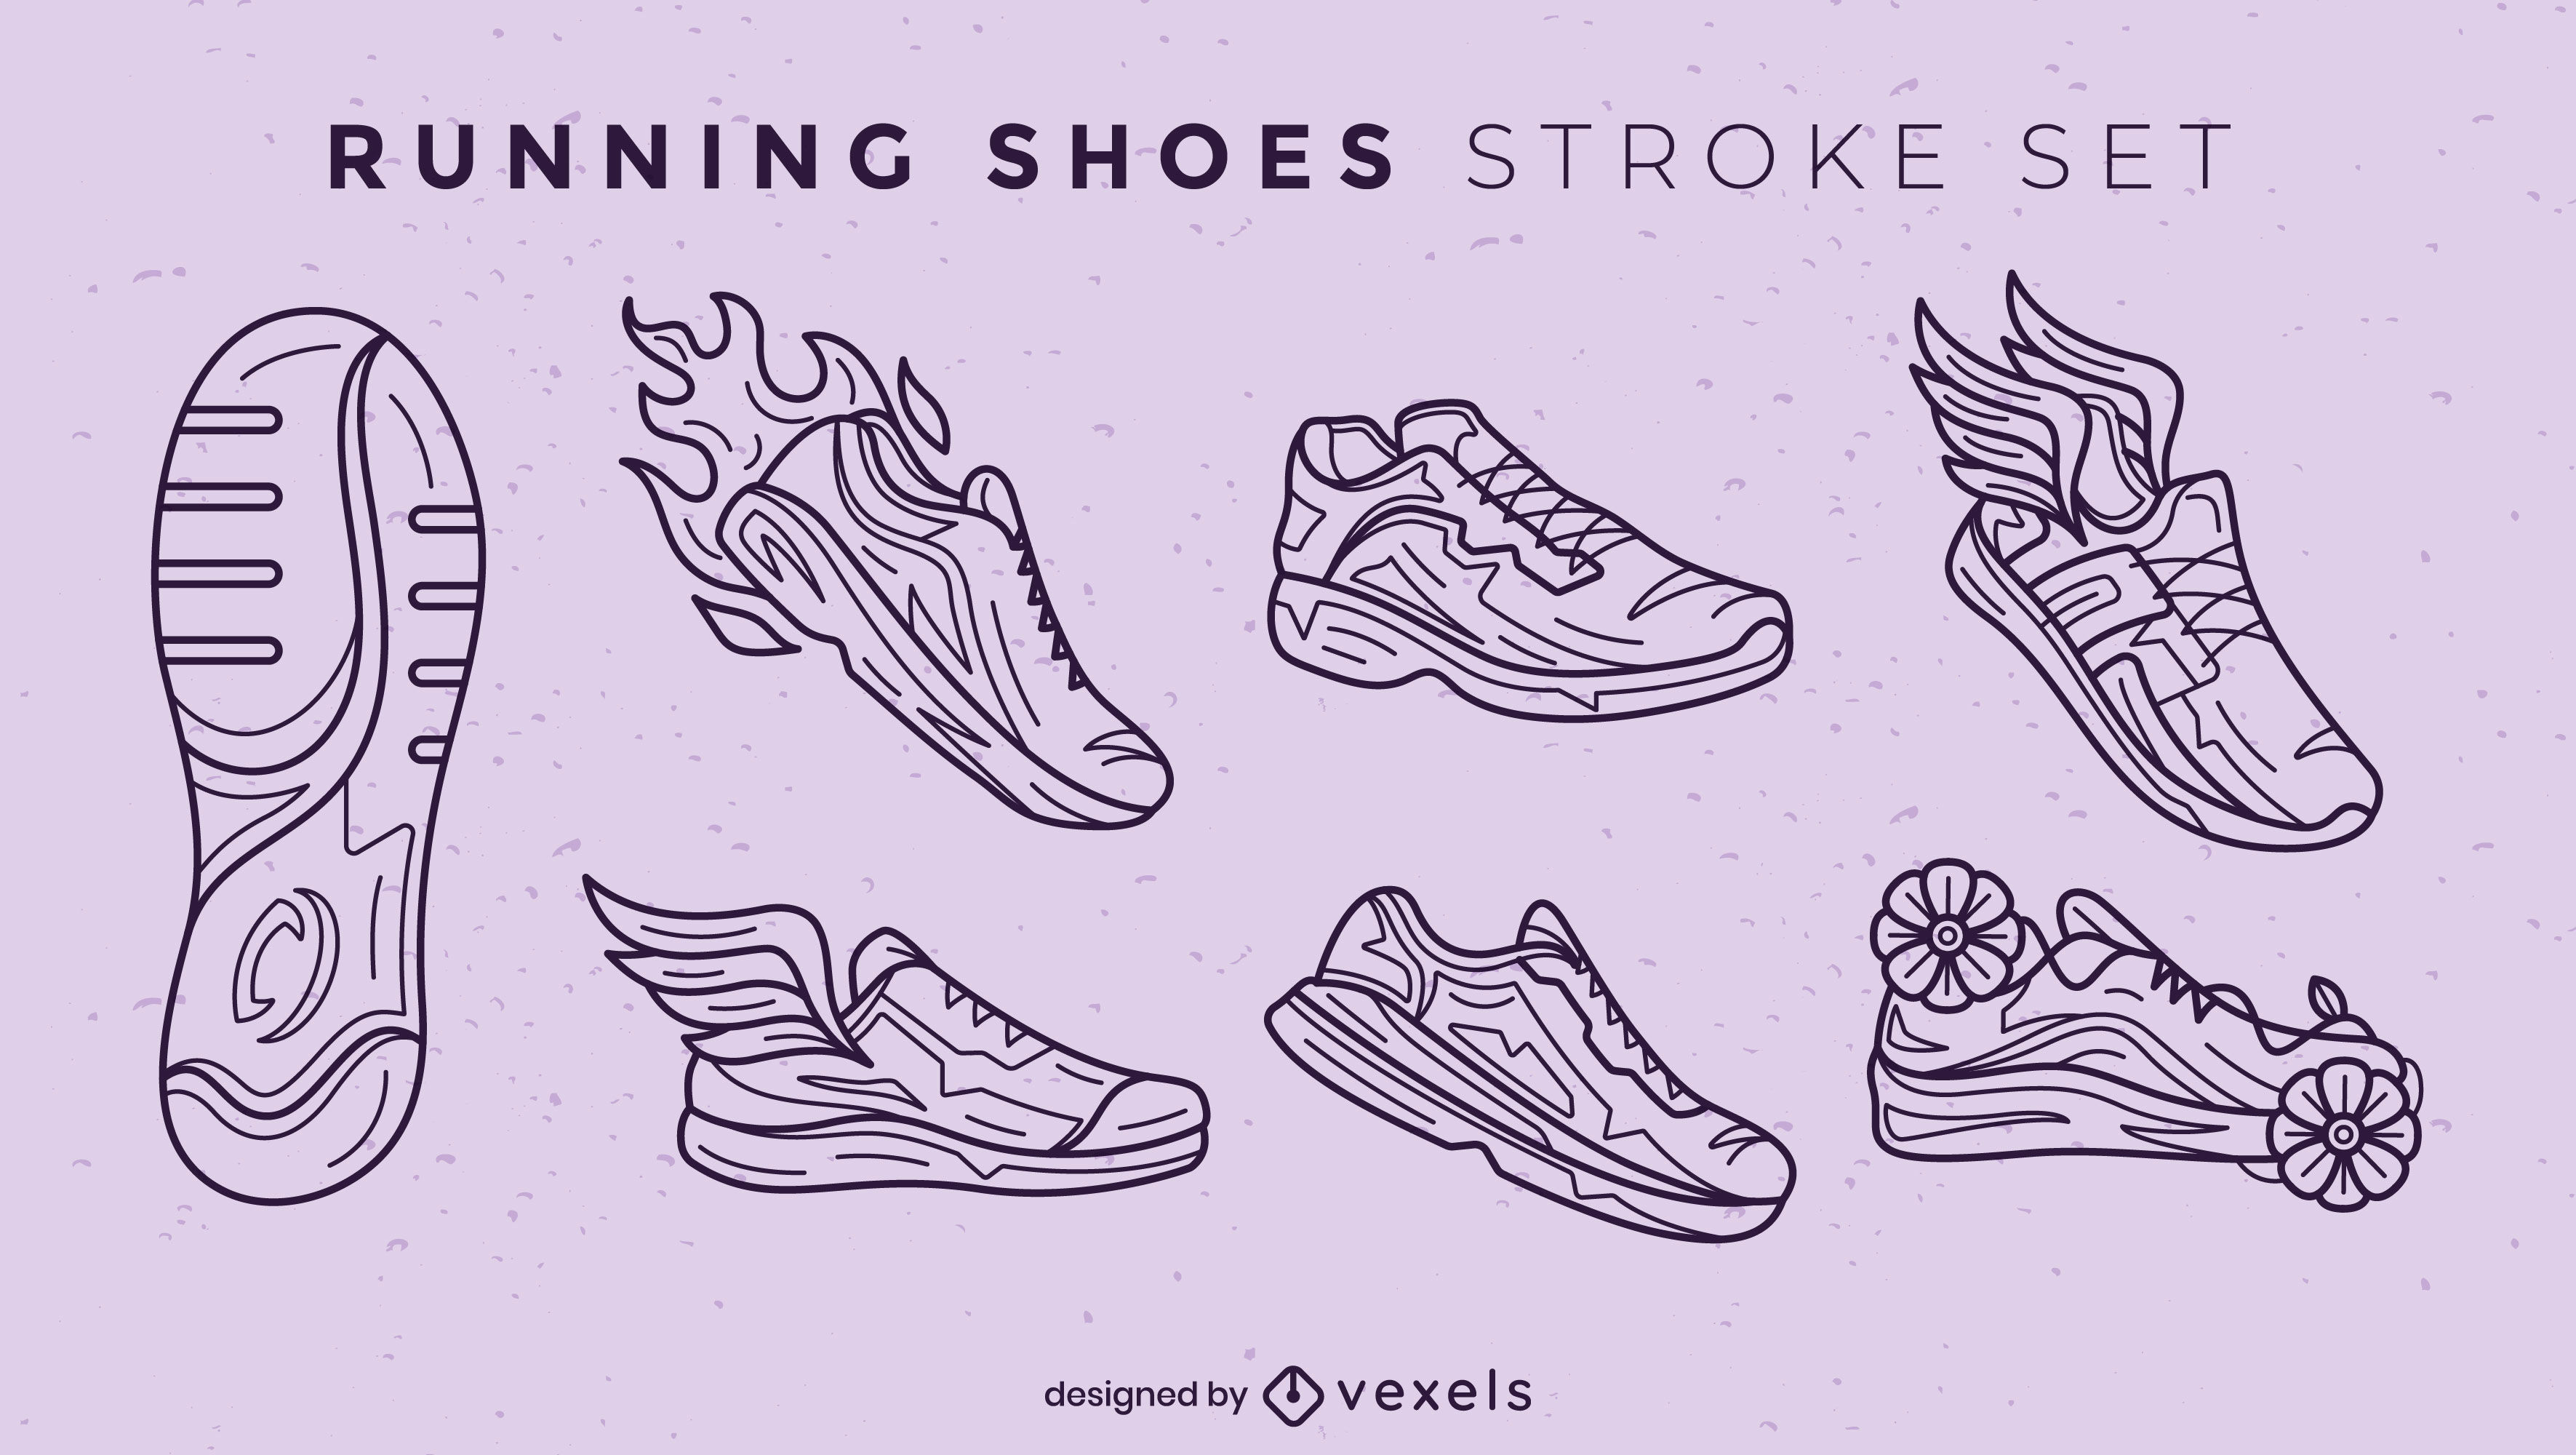 Trazo de elementos de zapatos para correr